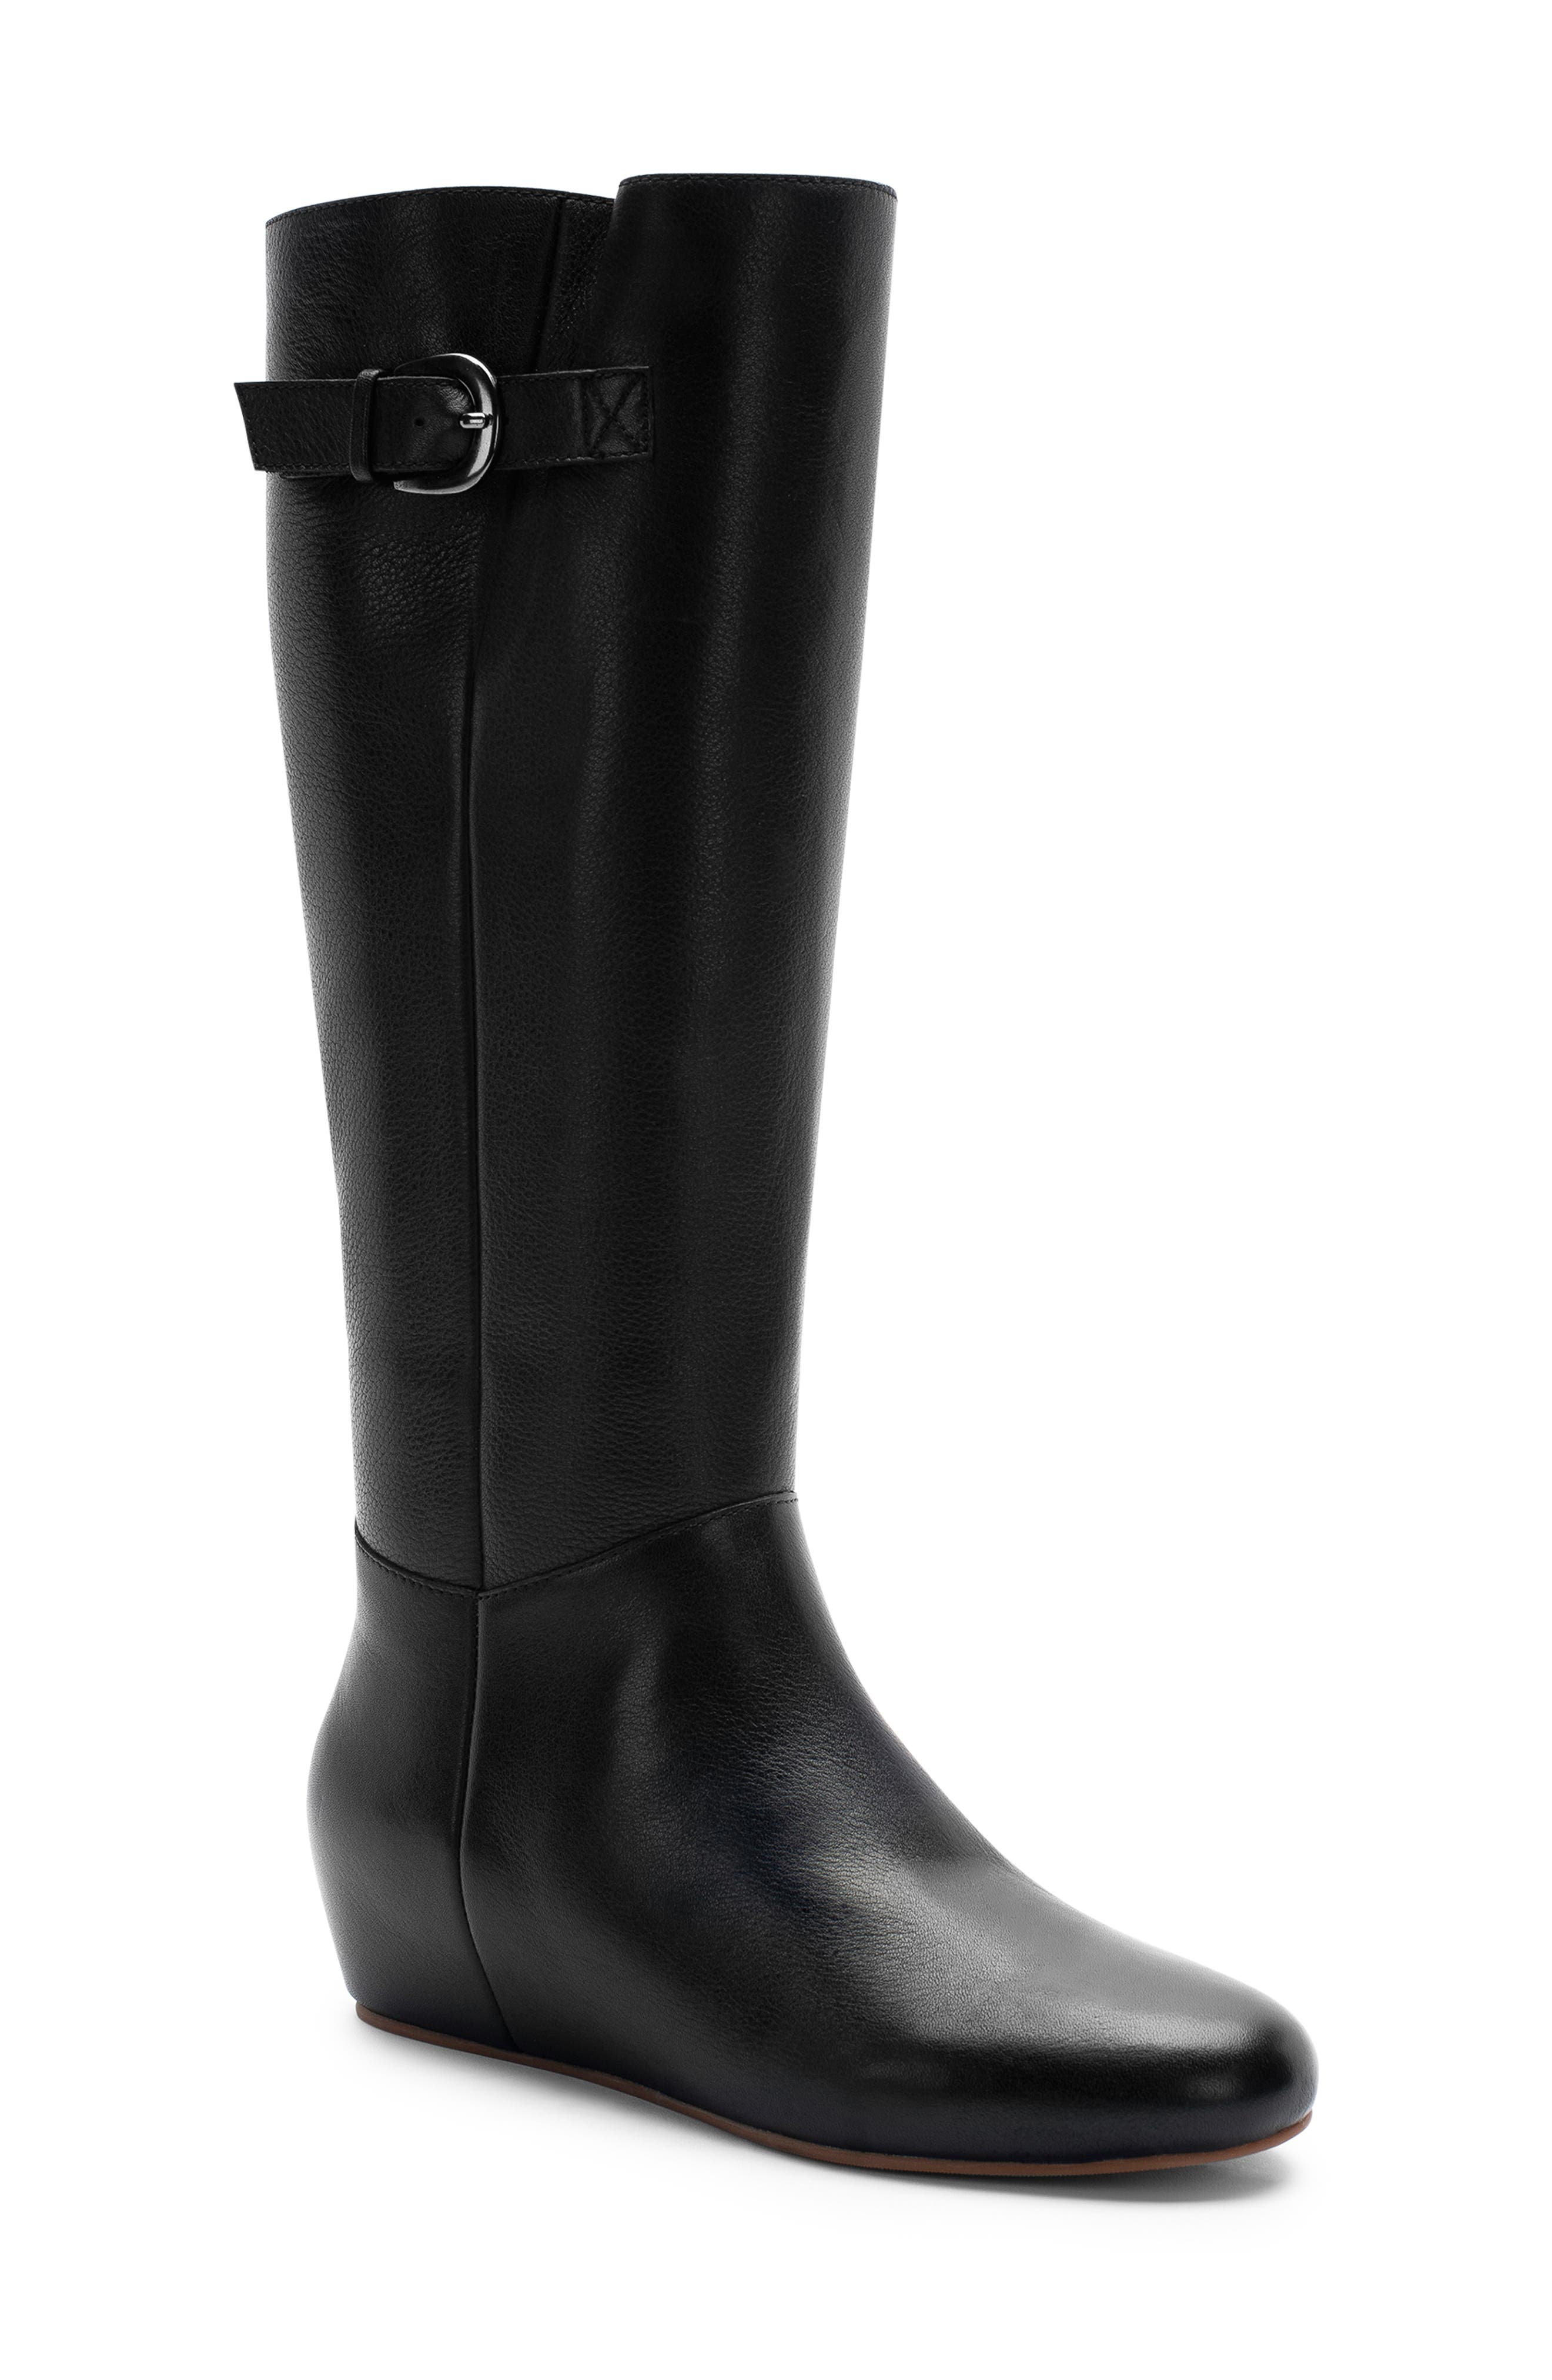 Blondo Monica Waterproof Boot, Black